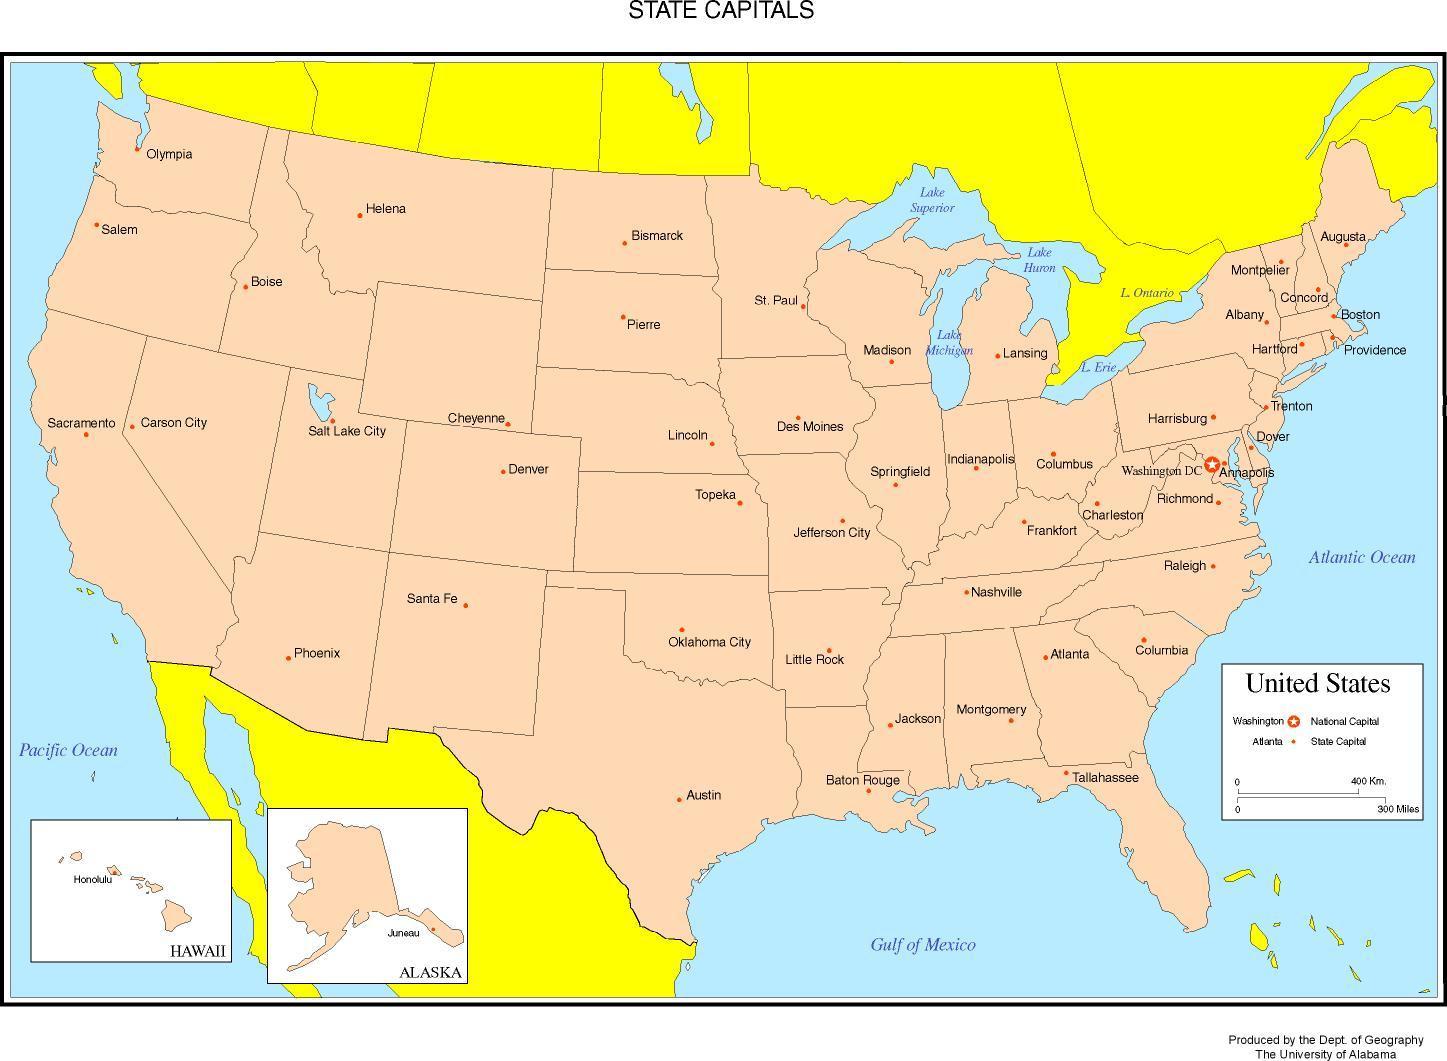 Map Of North America 50 States.Usa 50 States Map Usa Map 50 States Northern America Americas